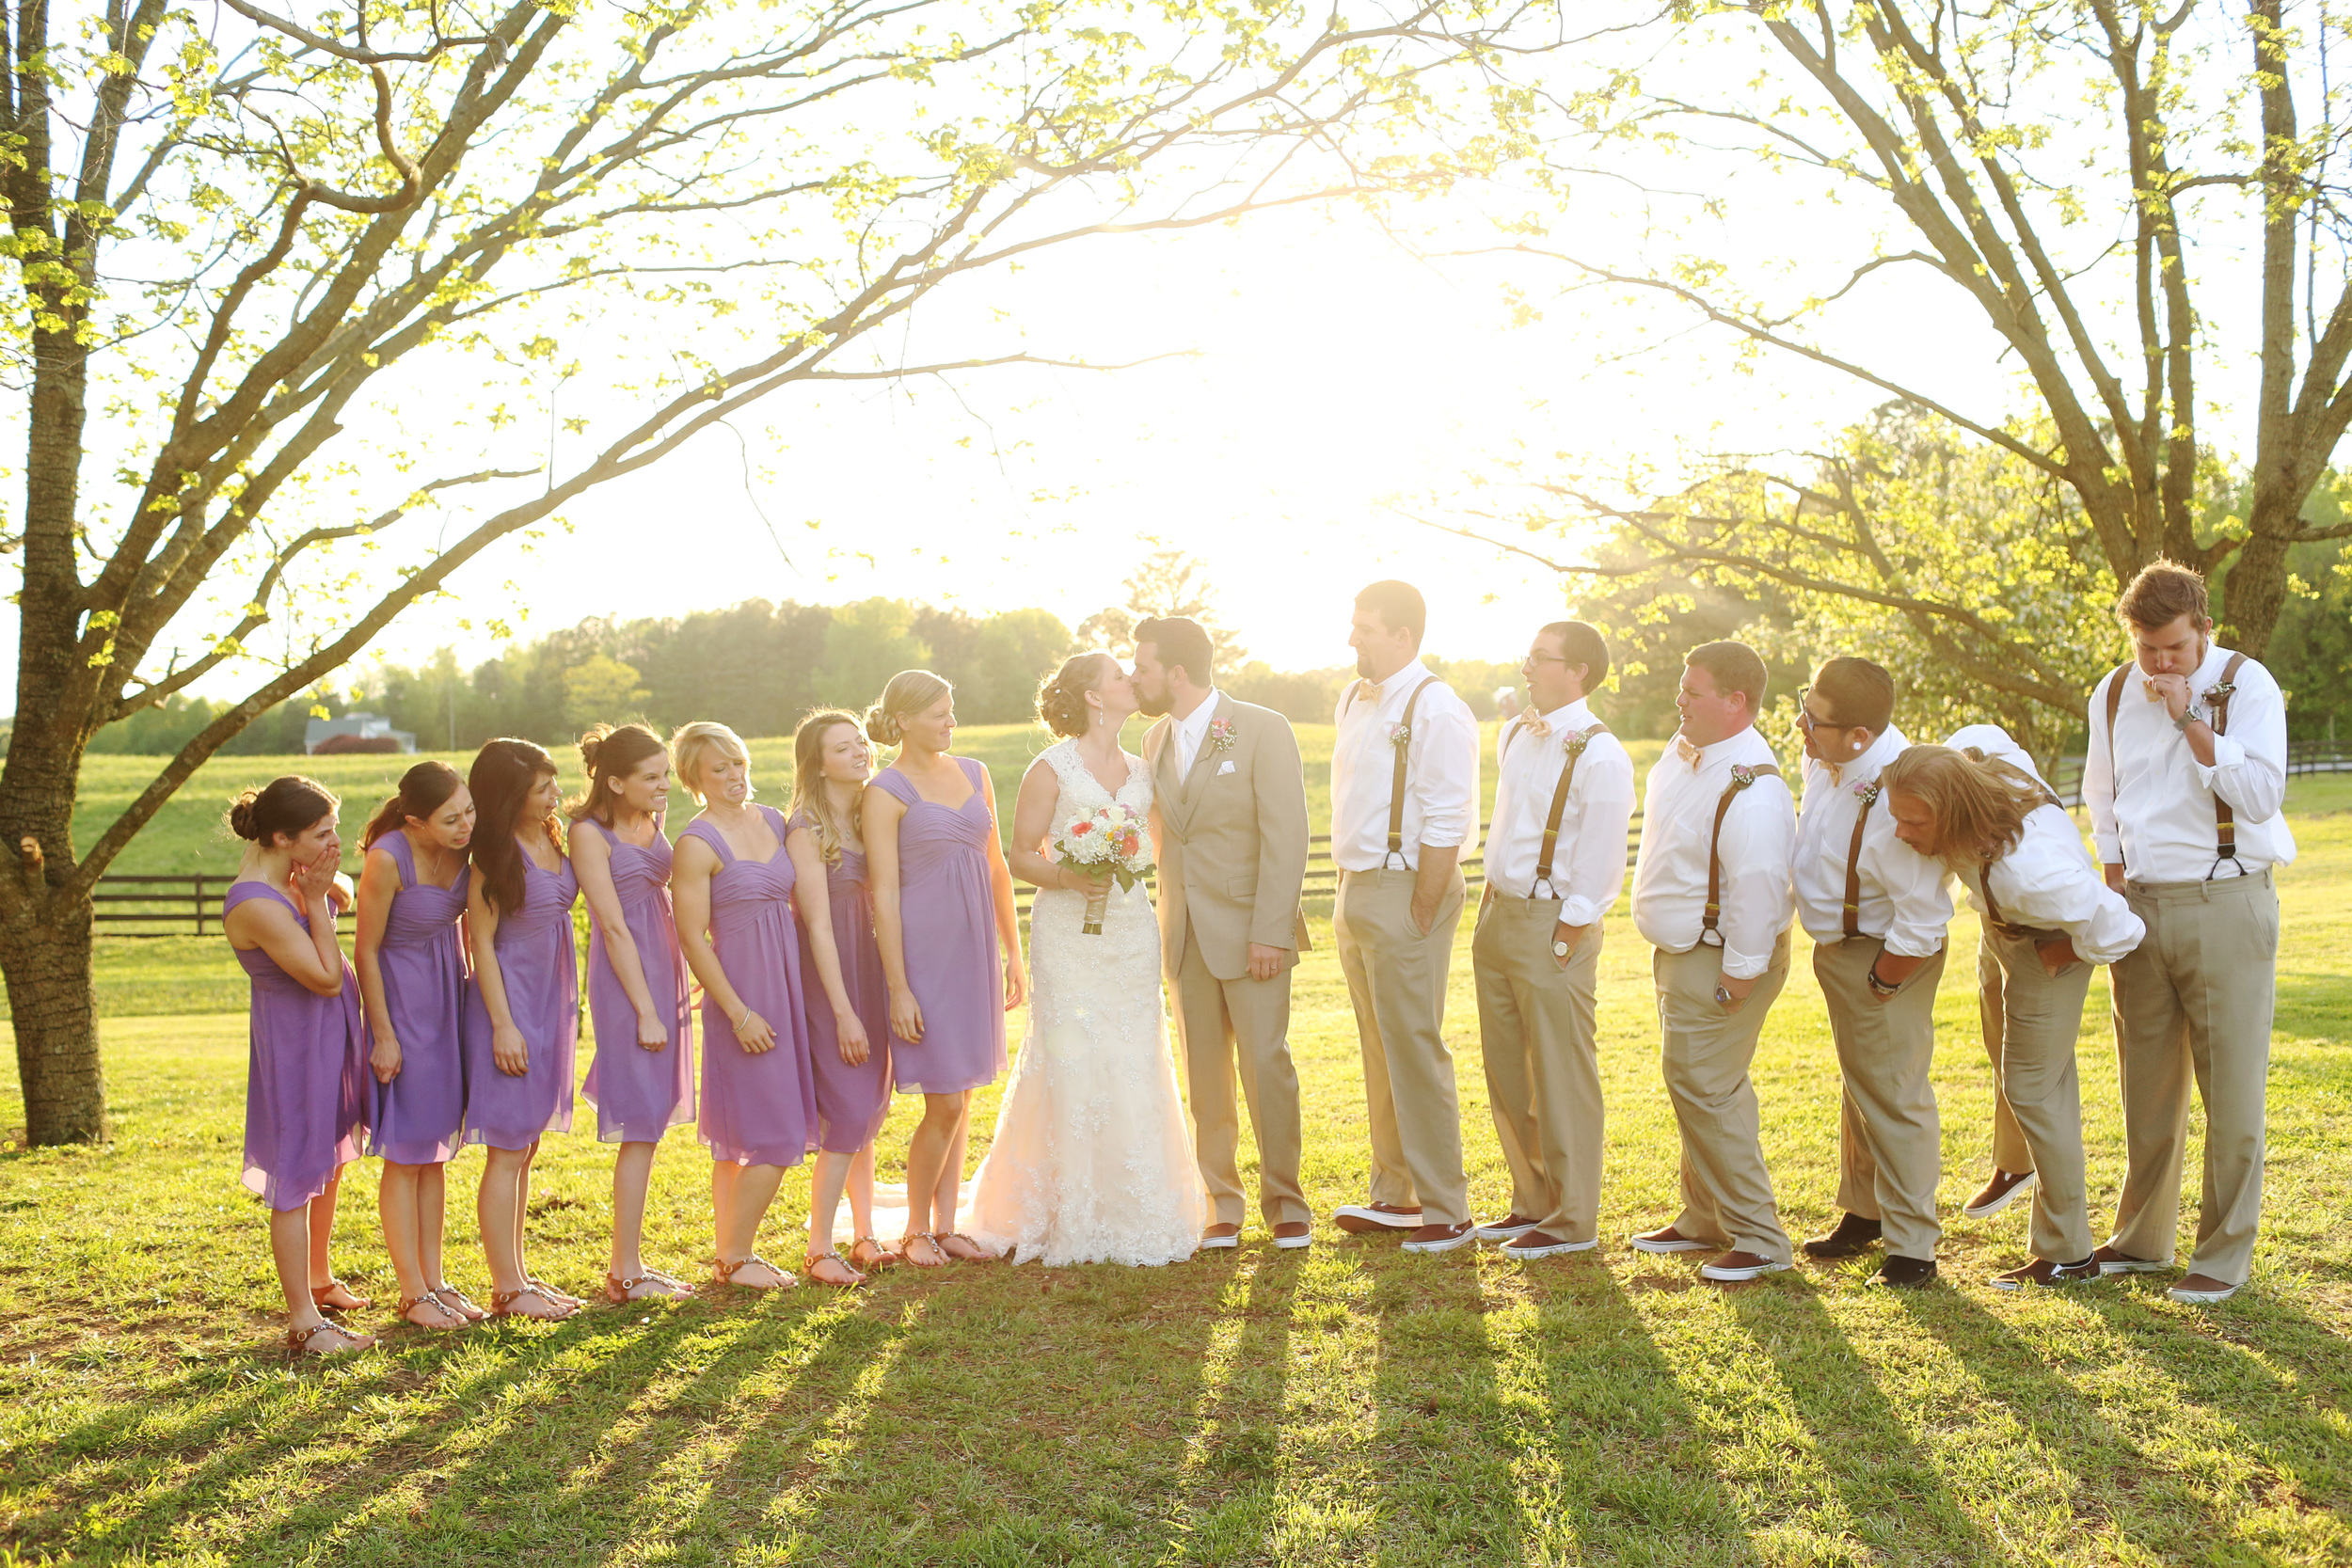 vaughan_weddingparty_116.JPG